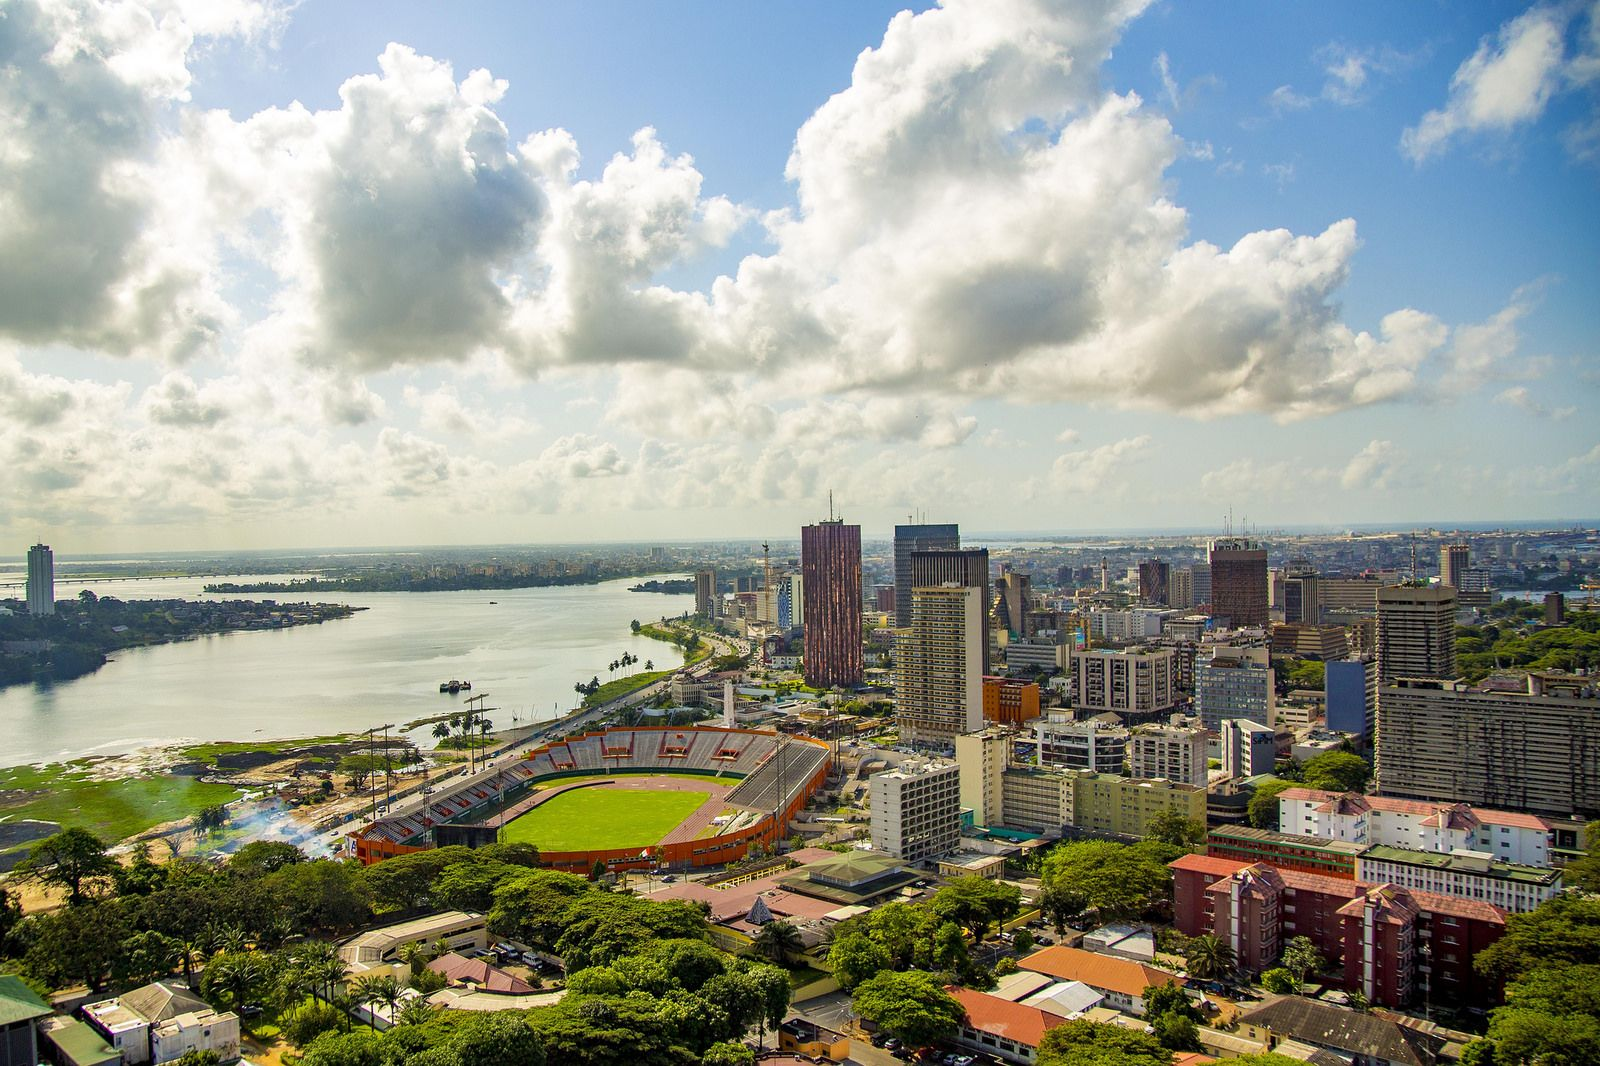 Abidjan Cote D Ivoire Photographie Citadine Ivoirien In 2020 Cool Places To Visit Africa Travel Ivory Coast